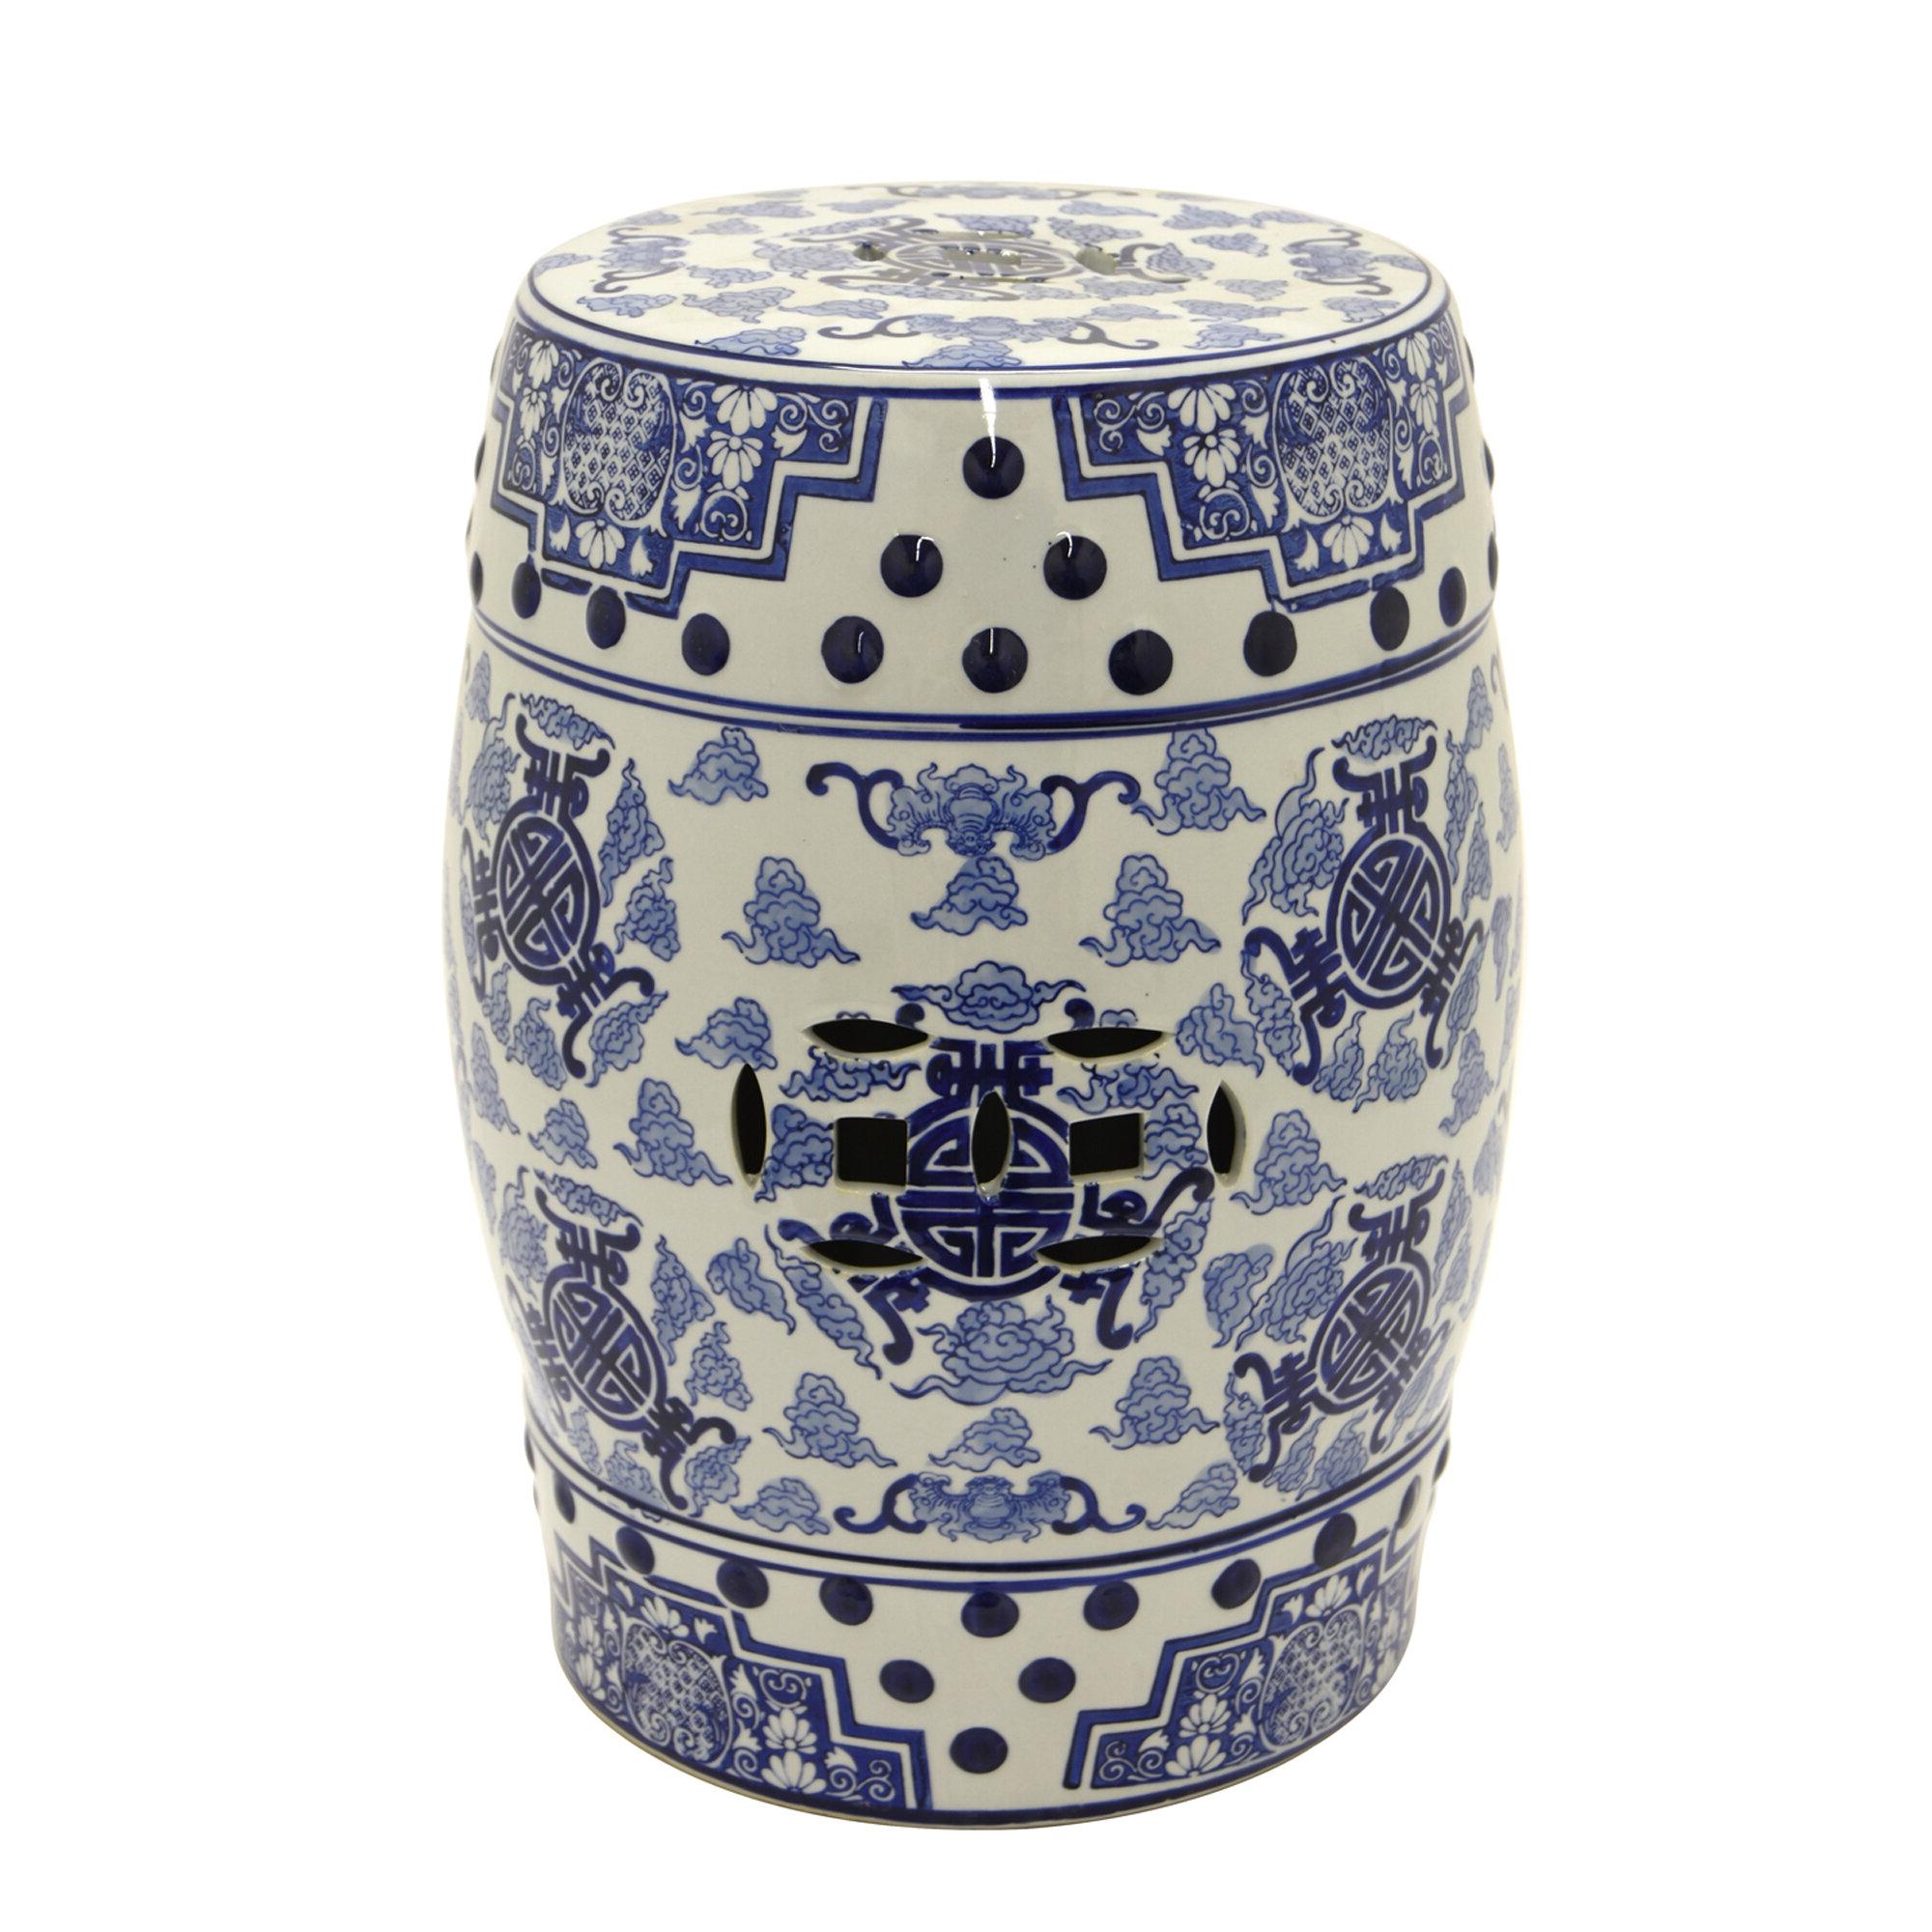 Bodner Ceramic Garden Stool Pertaining To Most Current Murphy Ceramic Garden Stools (View 3 of 30)